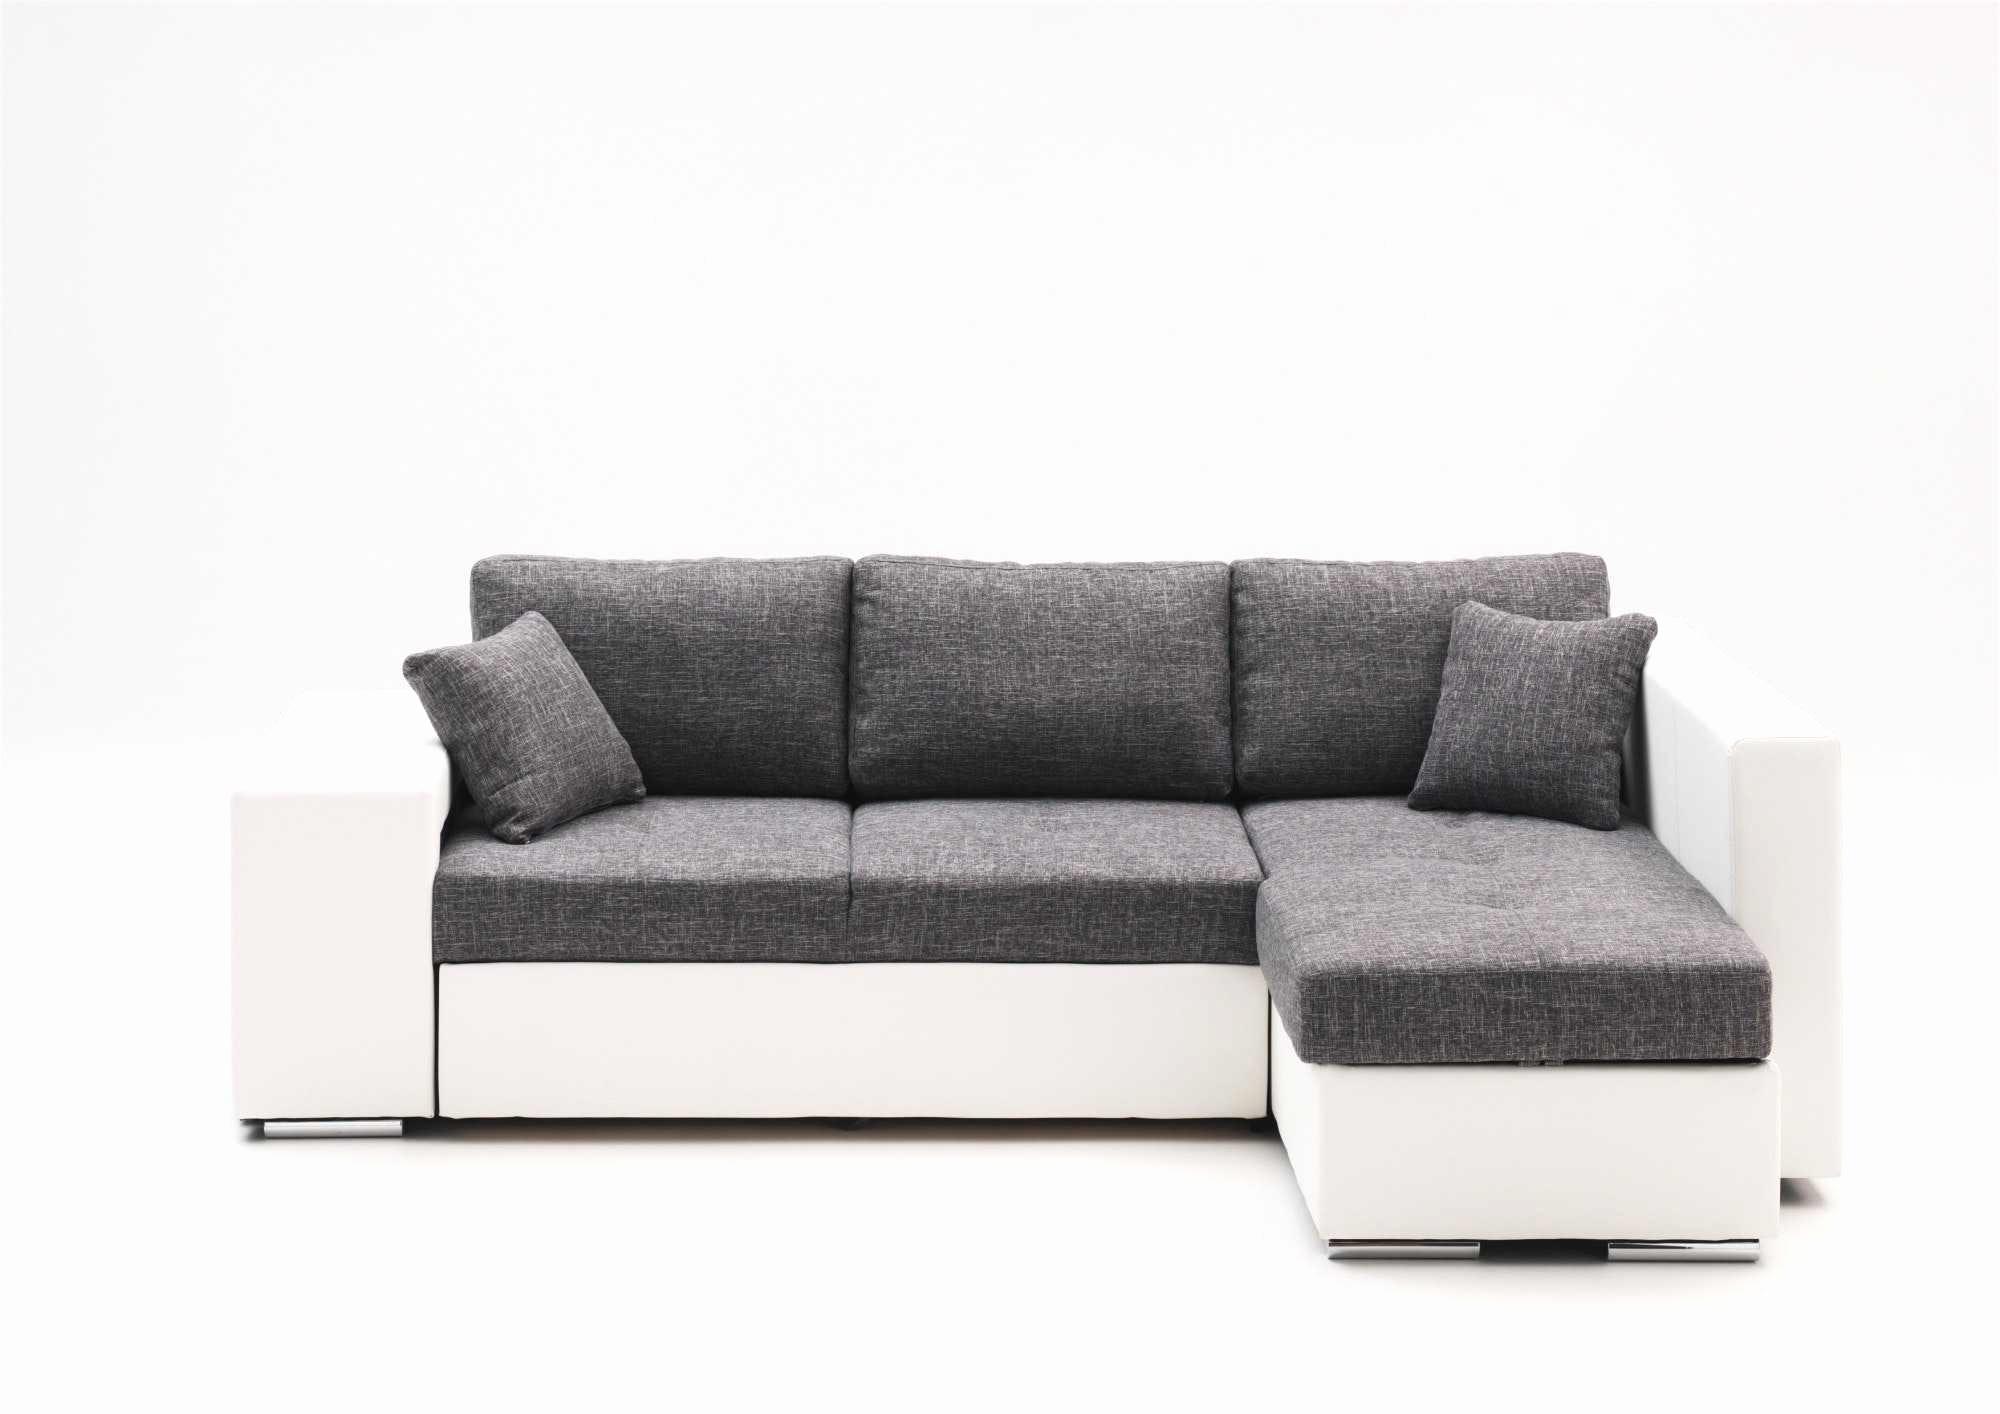 Canape Angle Convertible Ikea Meilleur De Photographie Clic Clac En Cuir Convertible Radioconexionanimal